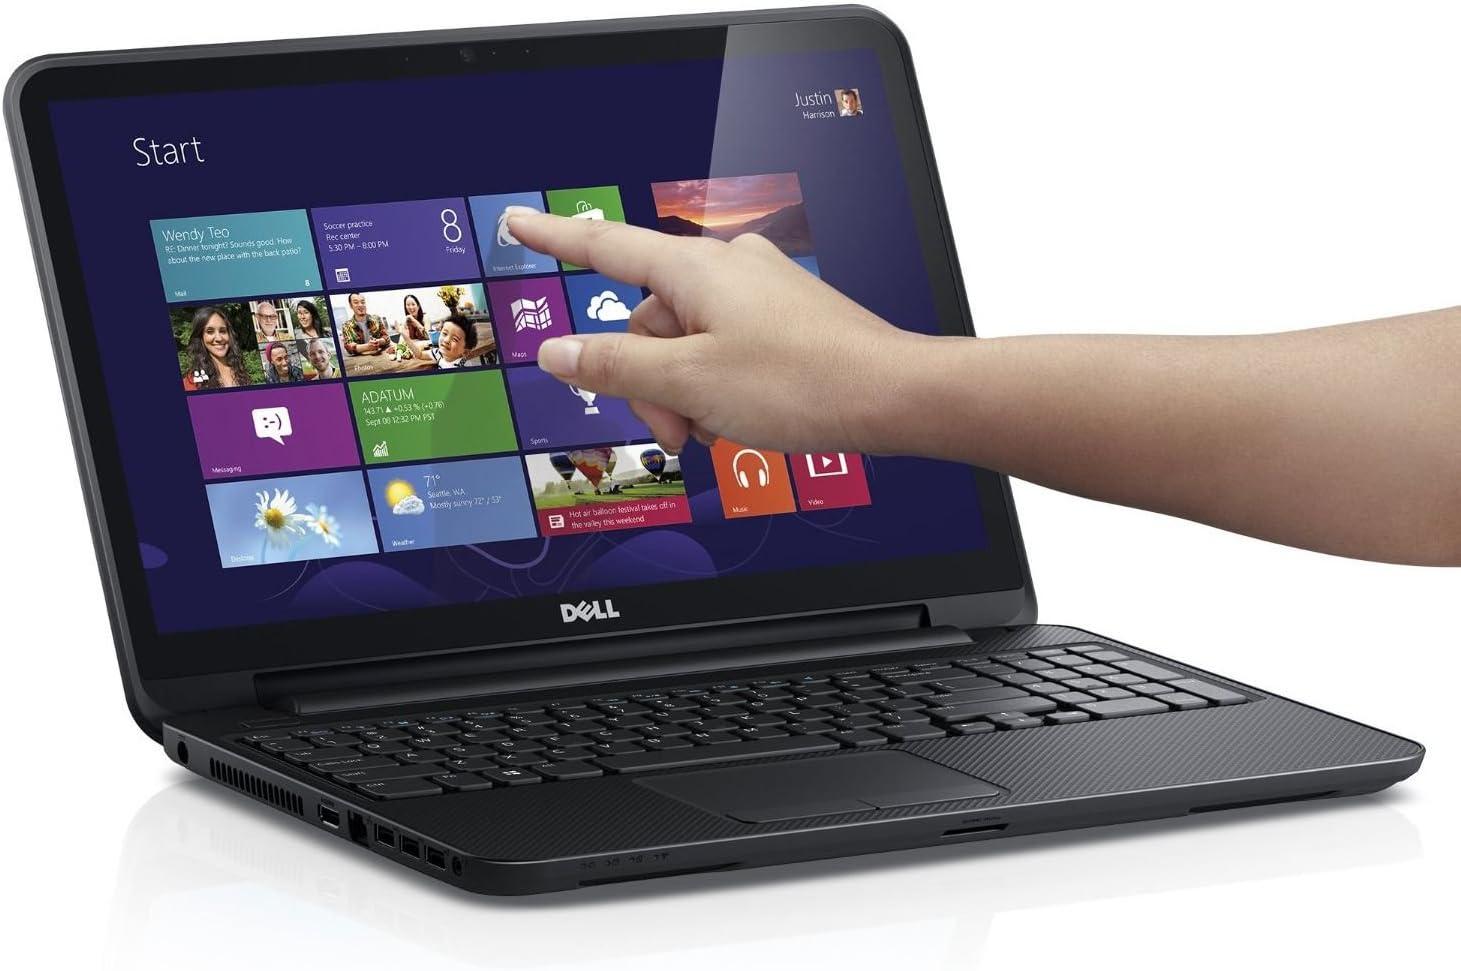 Newest Dell Latitude E5470 FHD (1920x1080) Touch Screen Business Laptop Notebook (Intel Quad Core i5-6300HQ, 16GB Ram, 500GB HDD, HDMI, VGA, Camera WiFi) Win 10 Pro (Renewed)